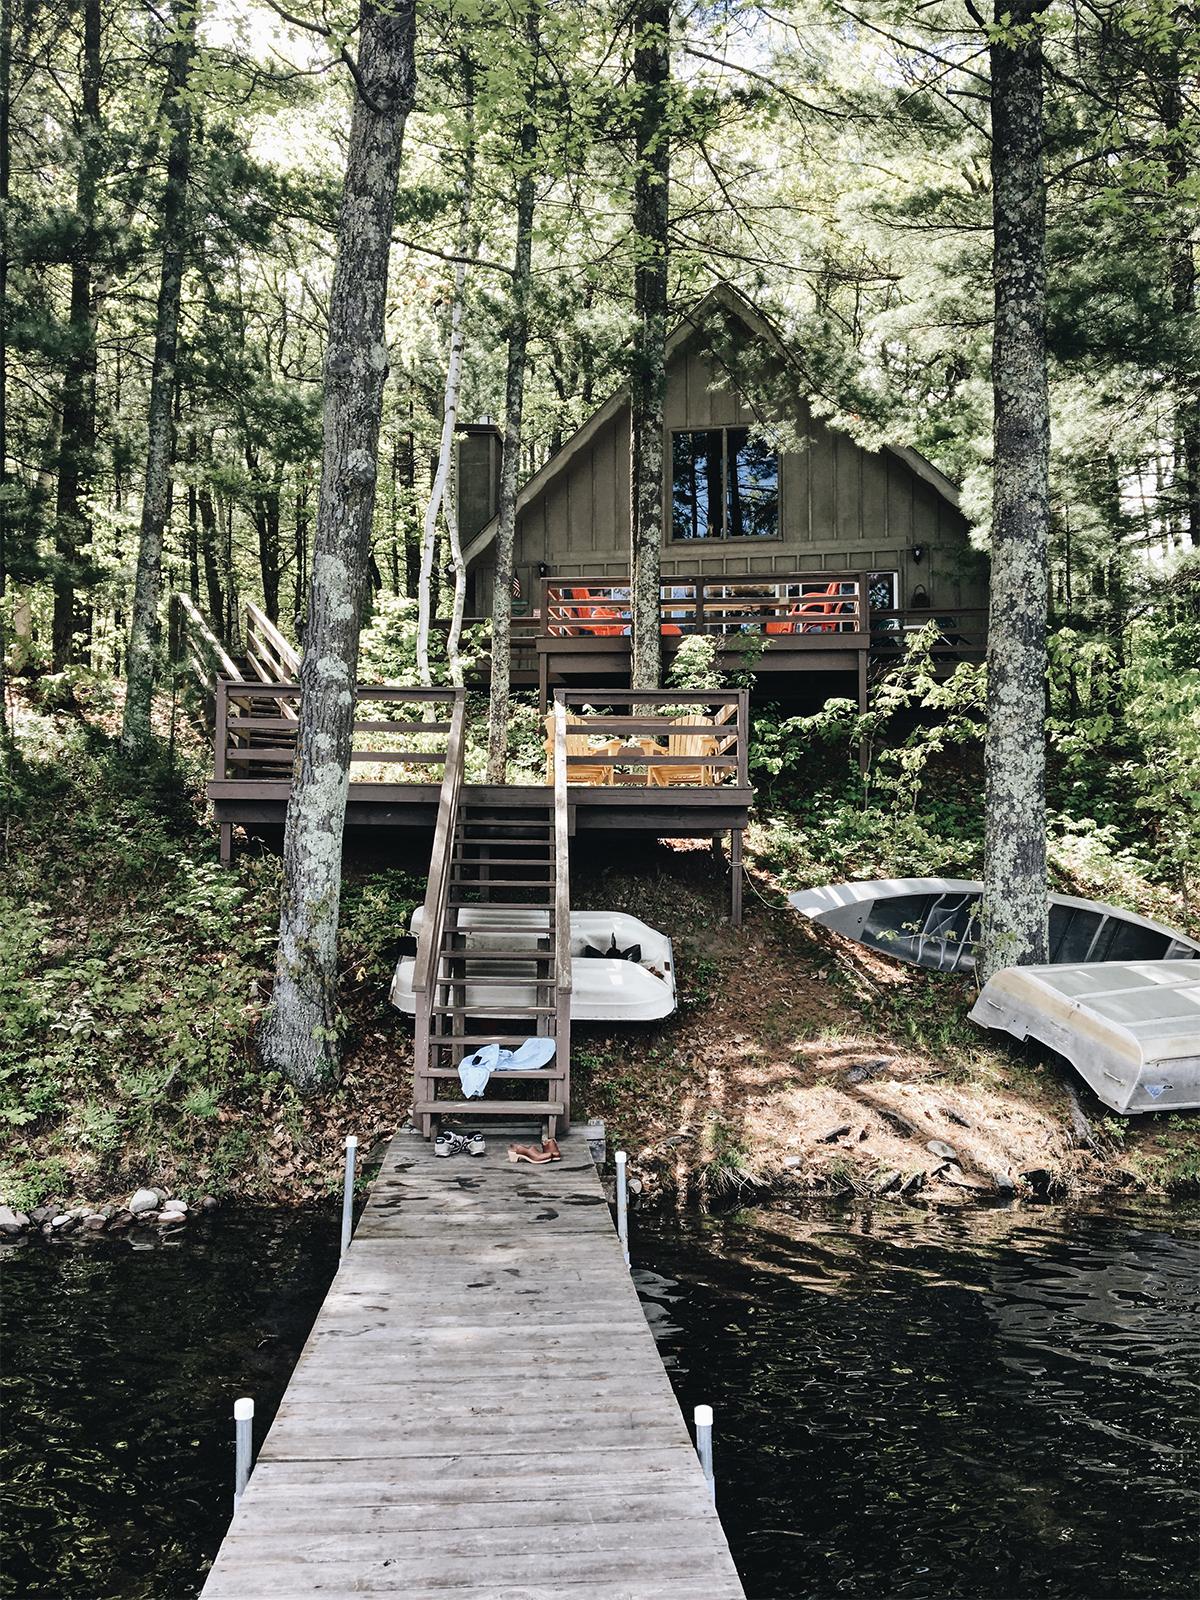 Allen Fam Cabin